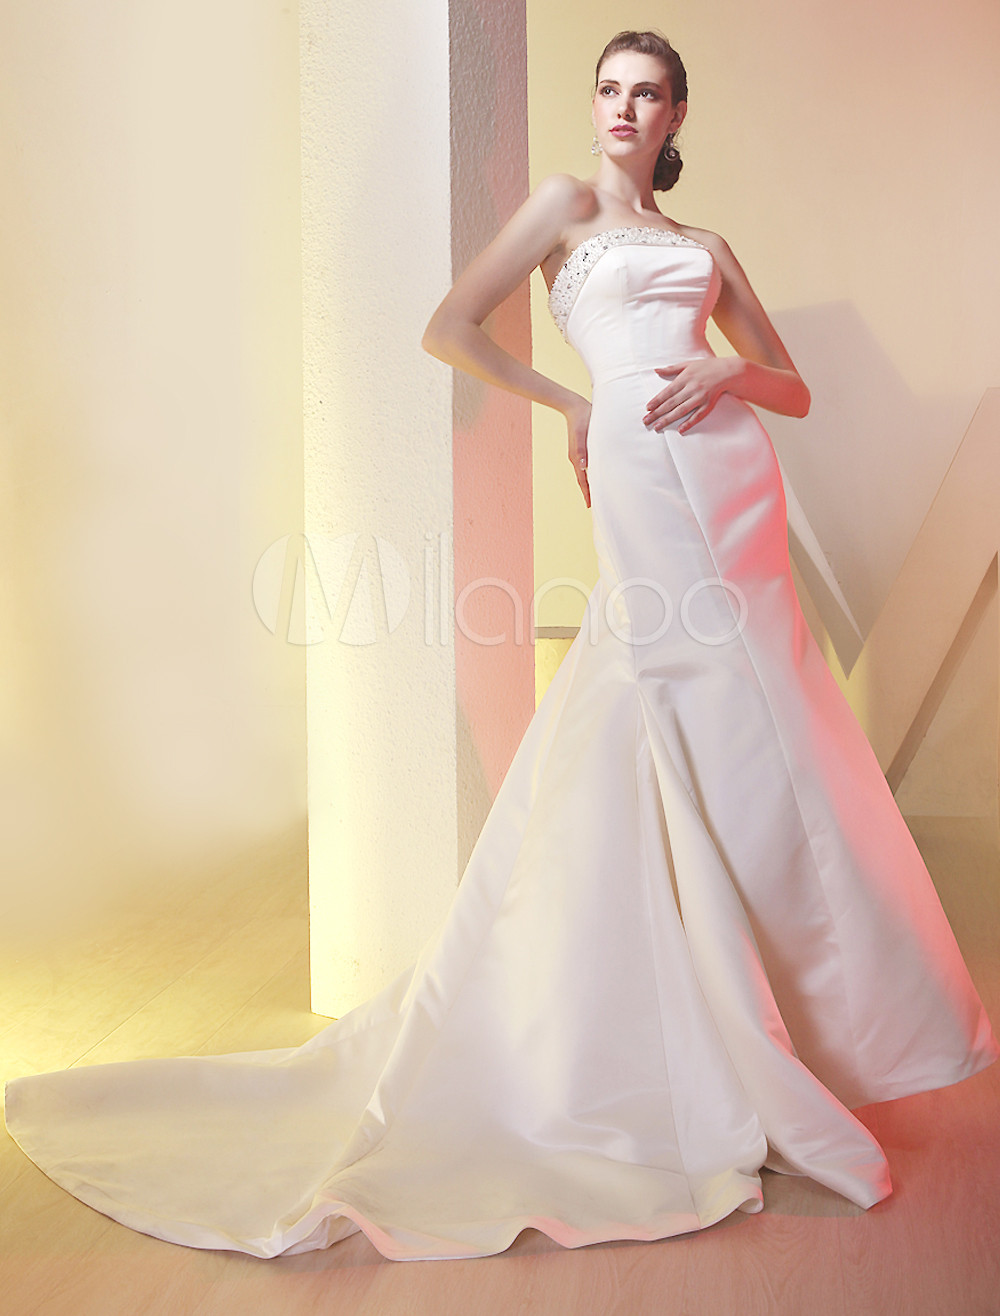 Satin Fishtail Wedding Dress : Modern white sweetheart strapless satin luxury wedding